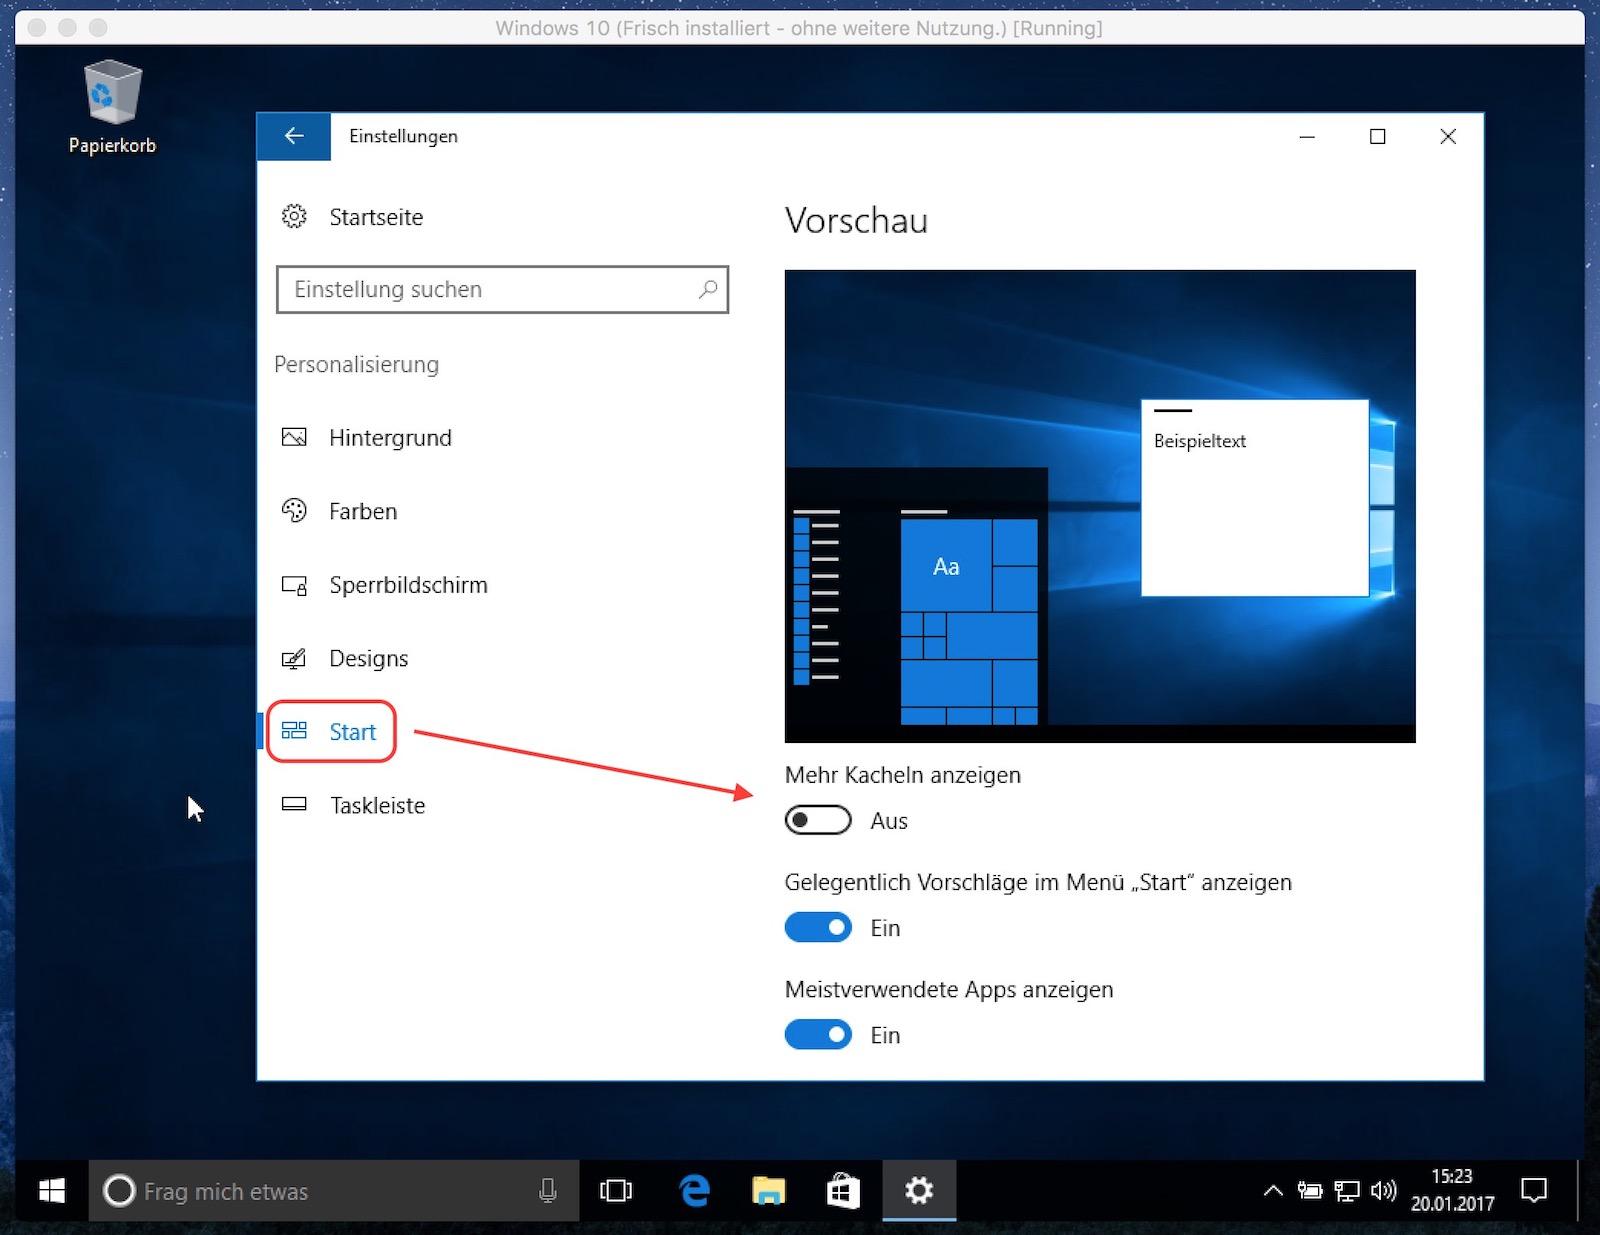 Windows 10 Startmenü mit mehr Kacheln